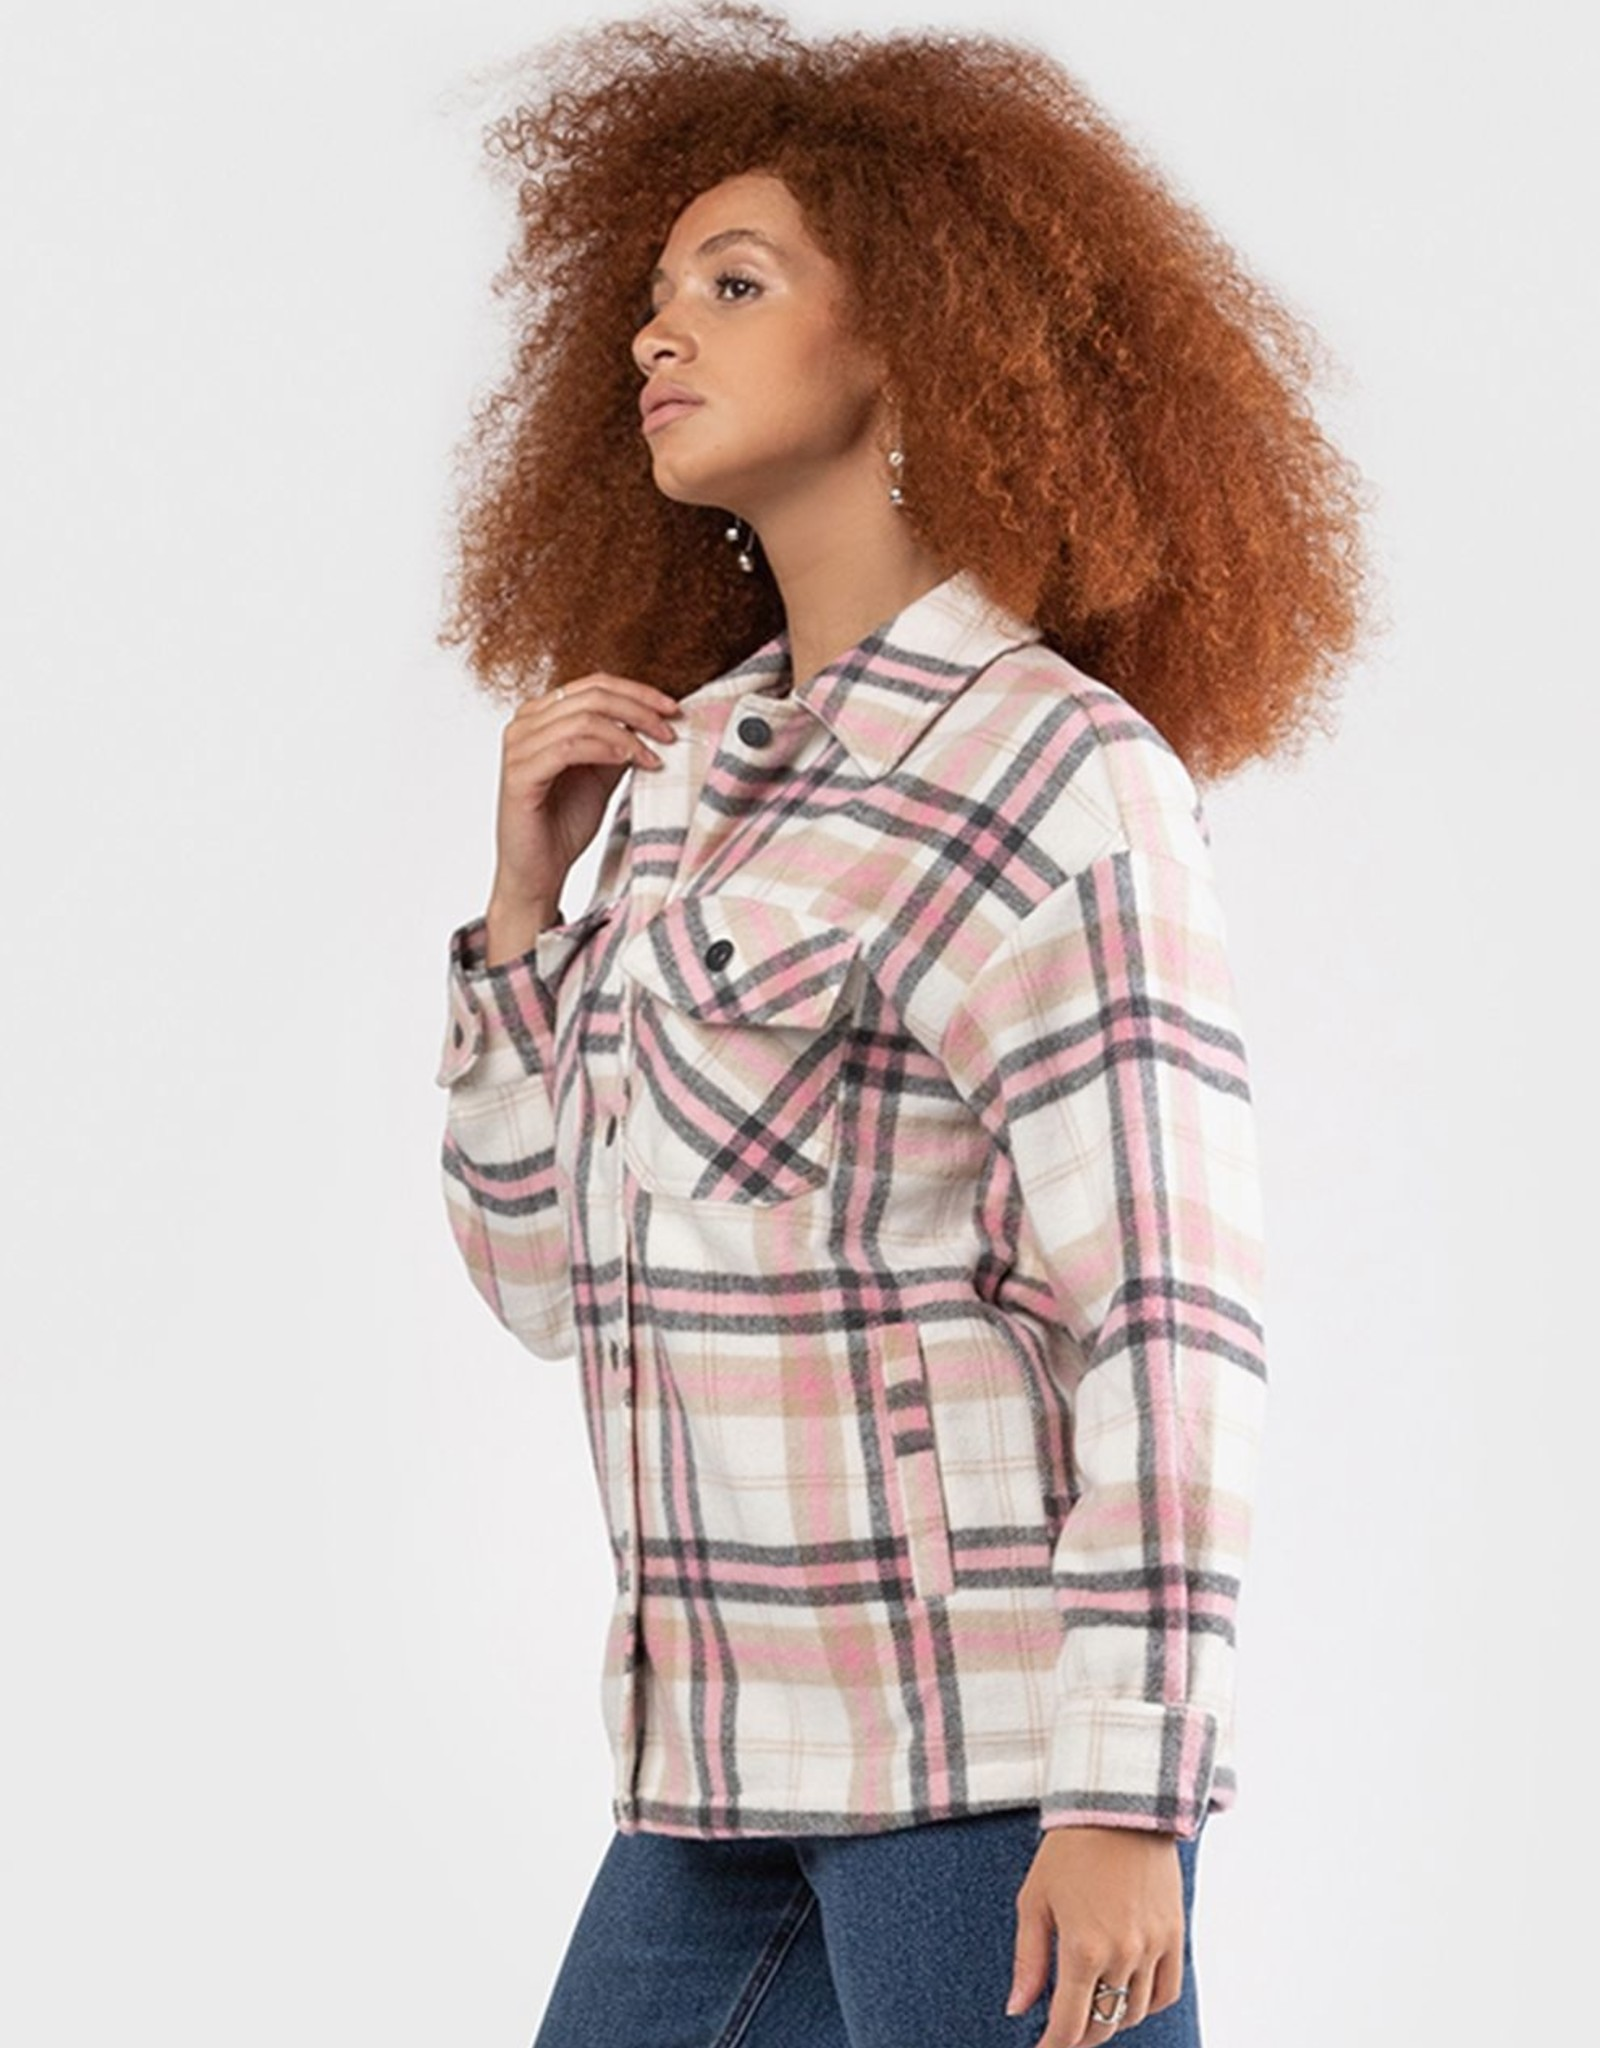 Black Tape White/Pink Plaid Overshirt